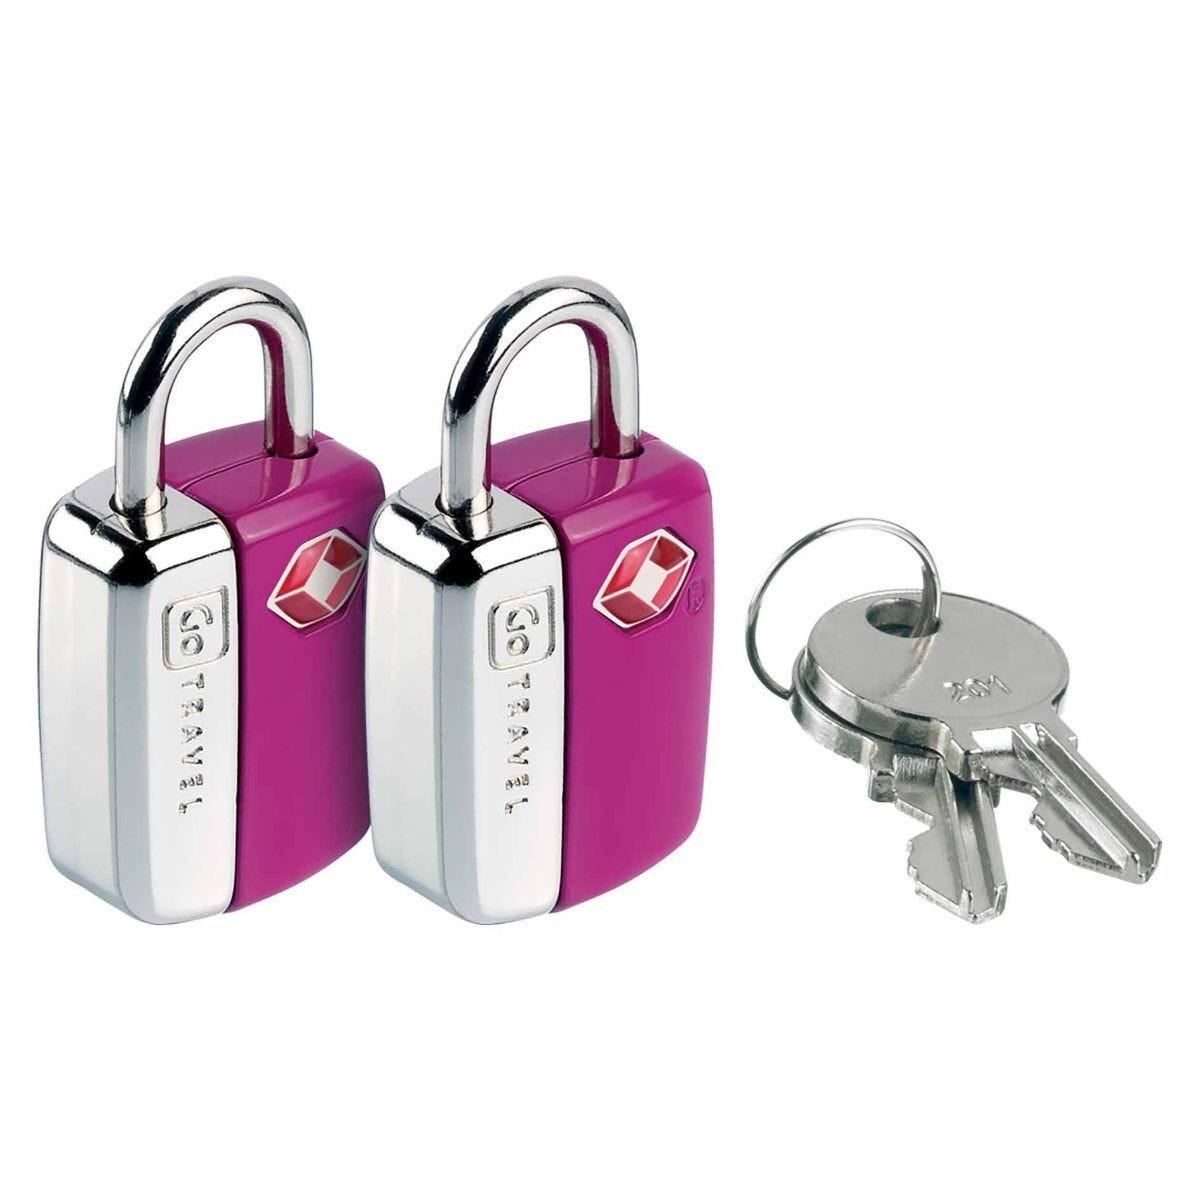 Go Travel Mini Travel Sentry Lock Pack of 2 Purple